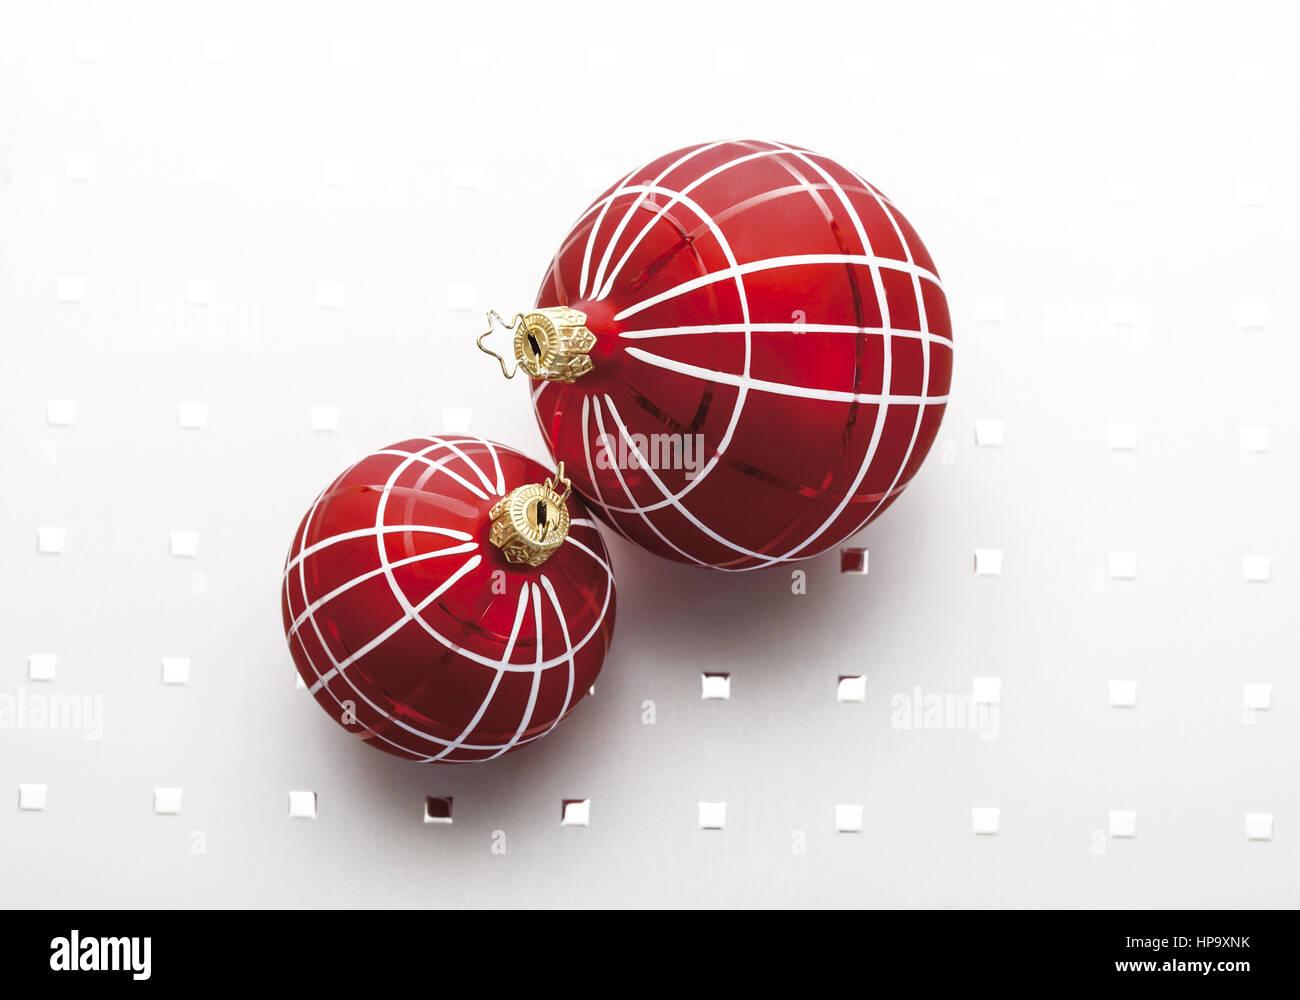 Rote Christbaumkugeln.Zwei Rote Christbaumkugeln Stock Photo 134213567 Alamy